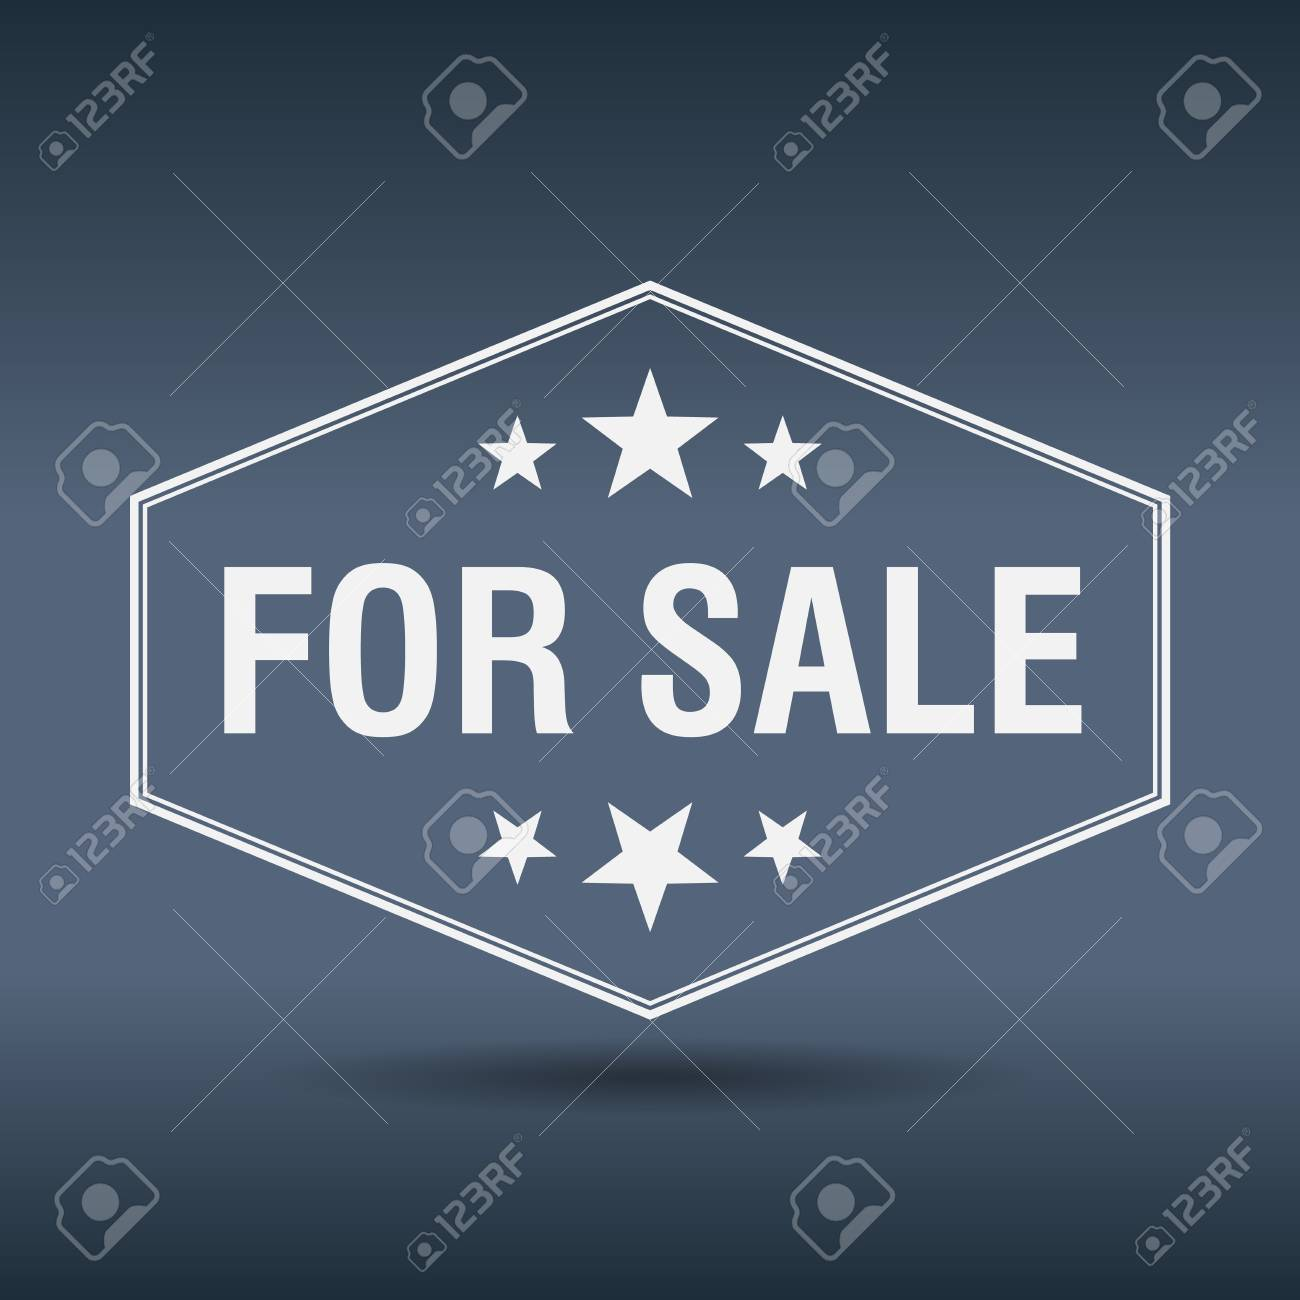 for sale hexagonal white vintage retro style label - 39394741